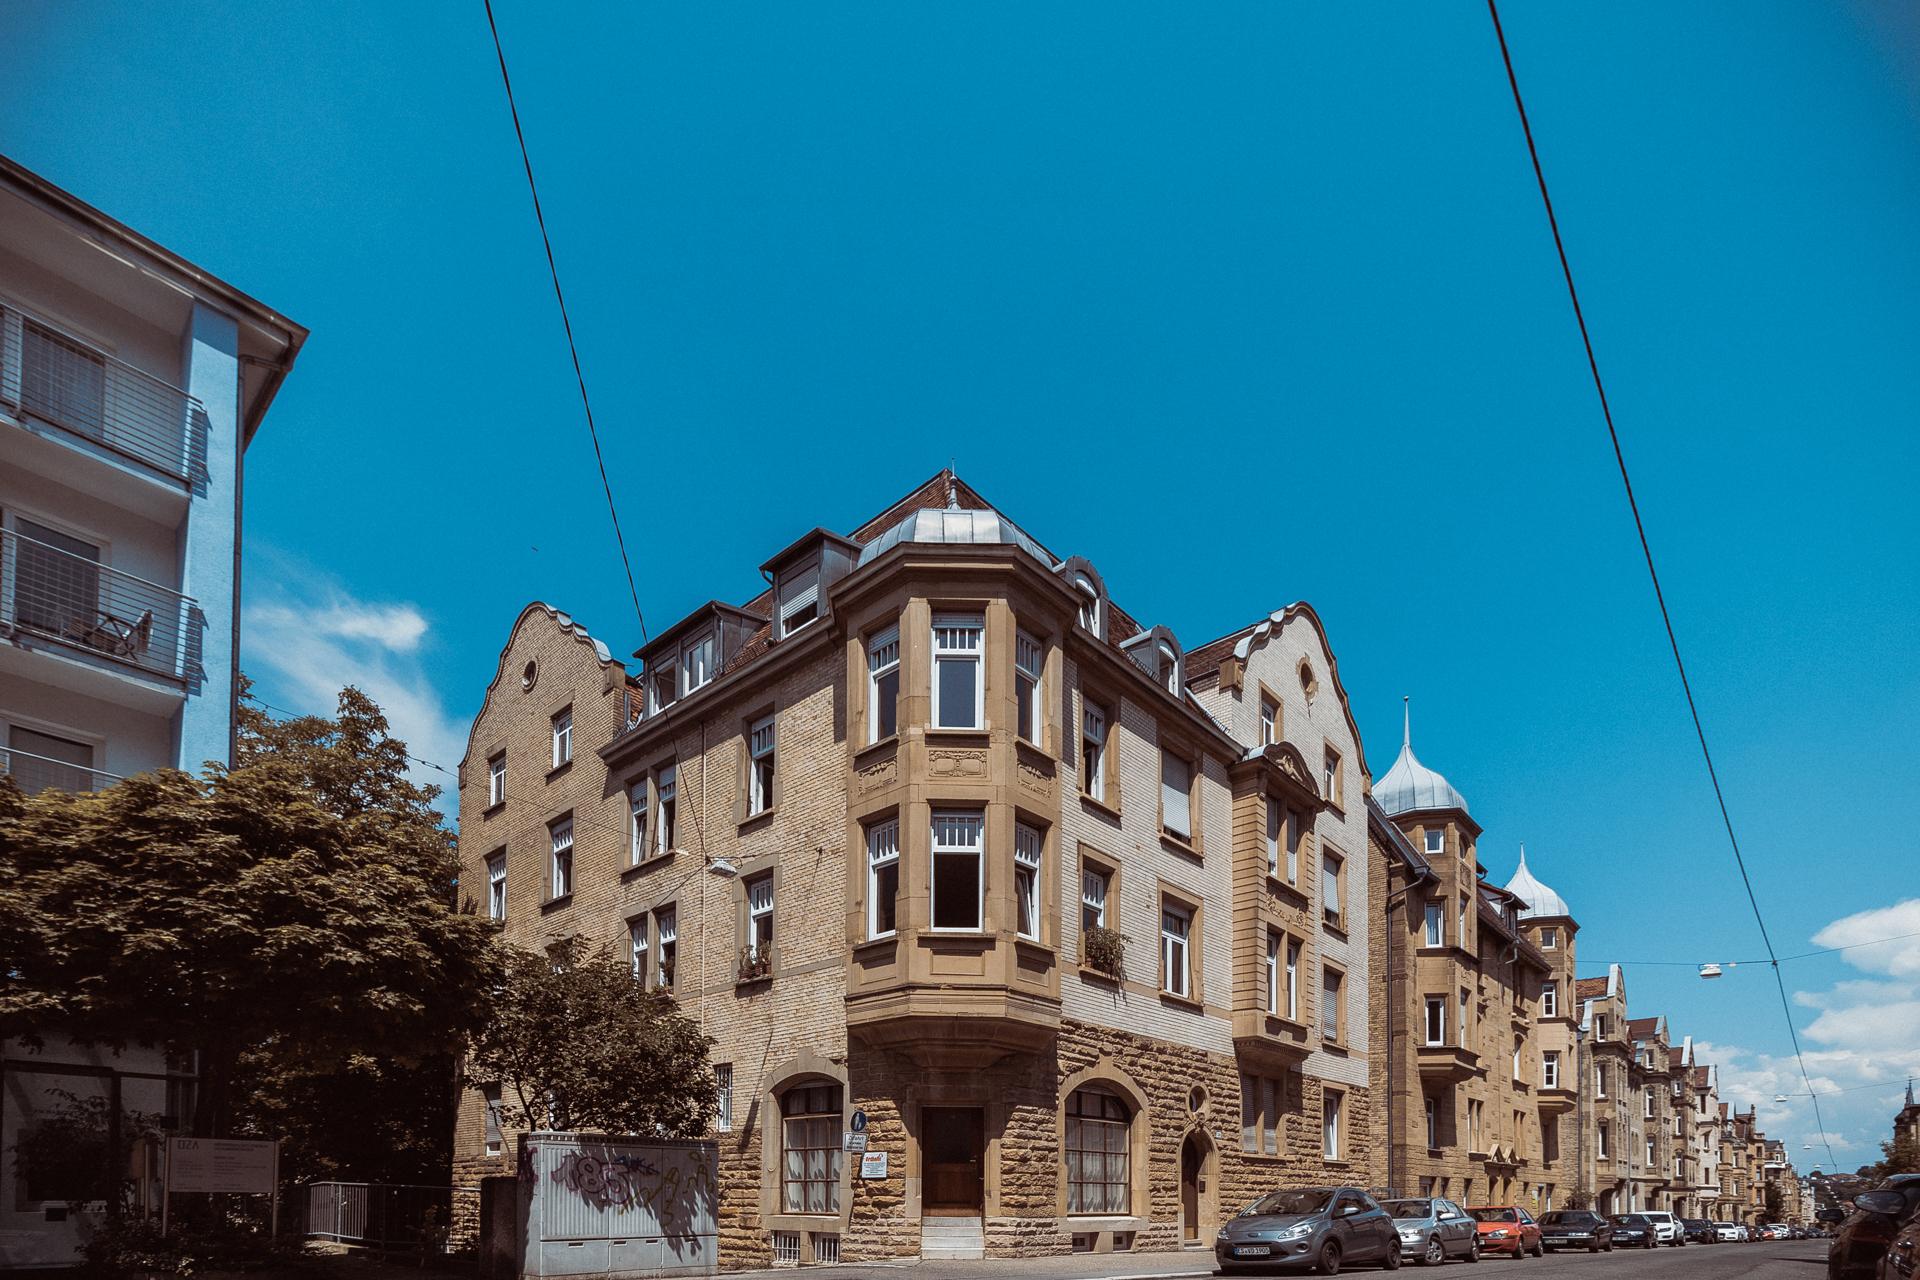 Orthofit in der Alexanderstraße